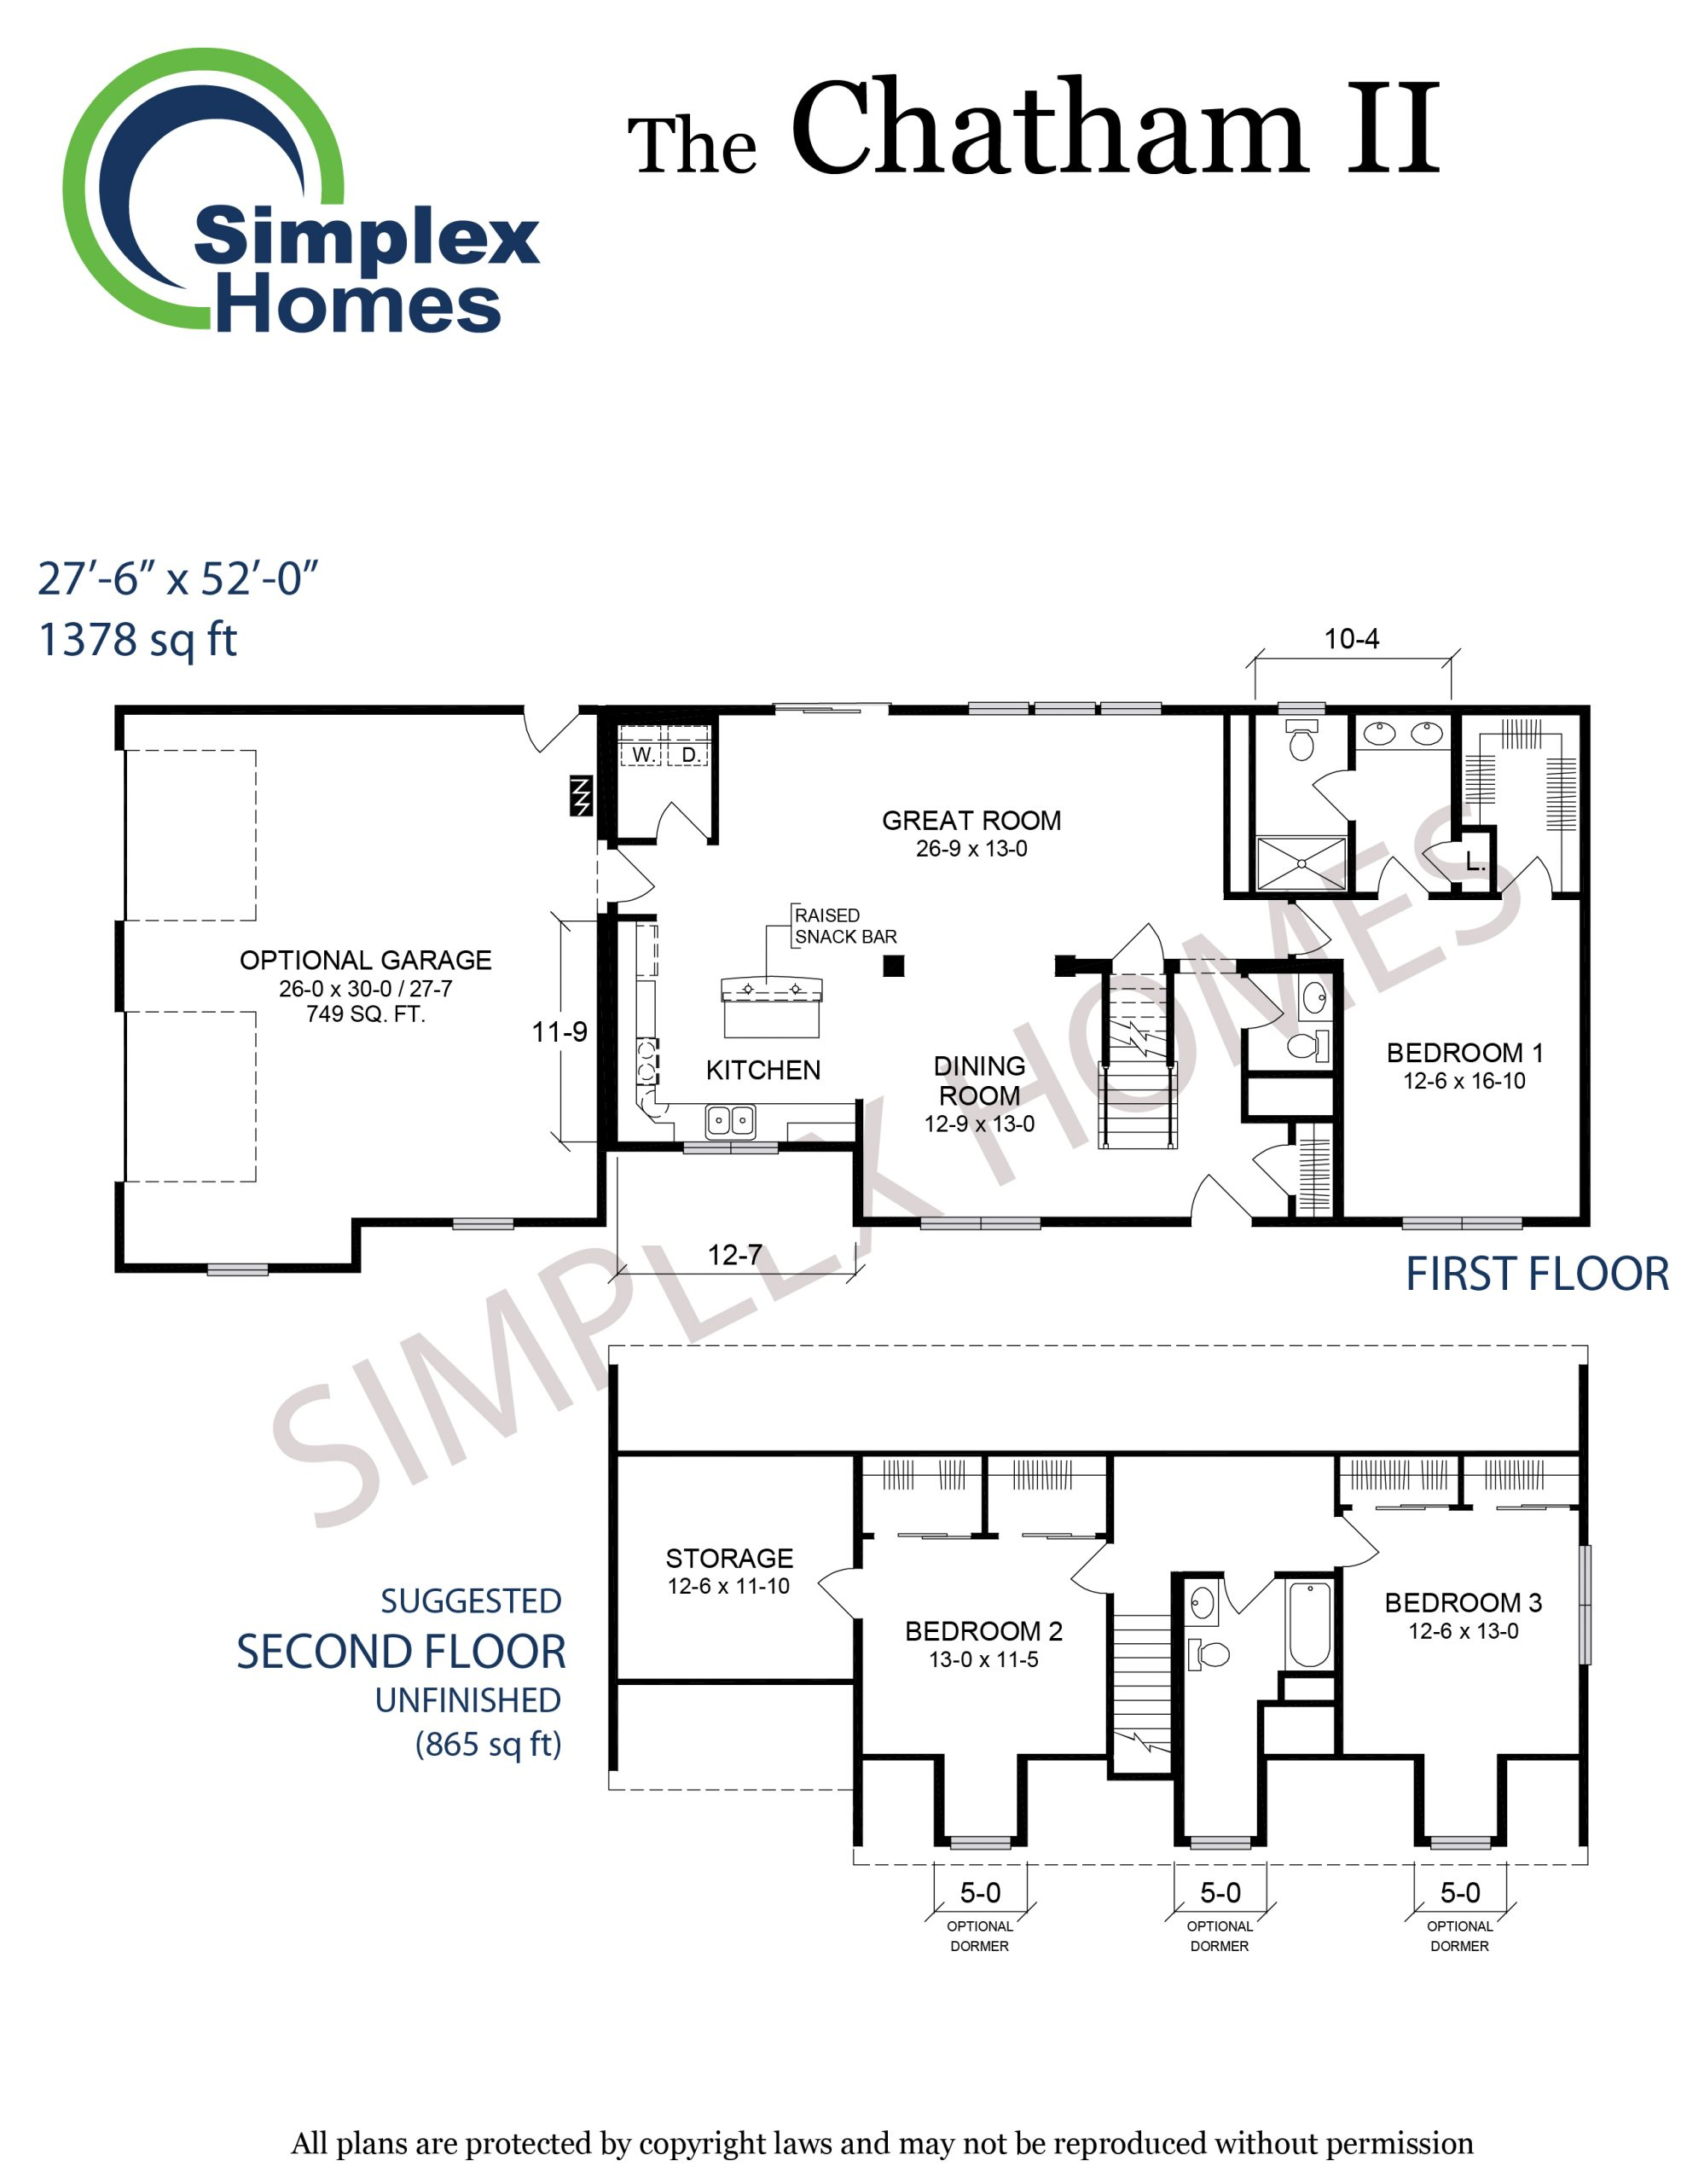 Chatham II floor plan